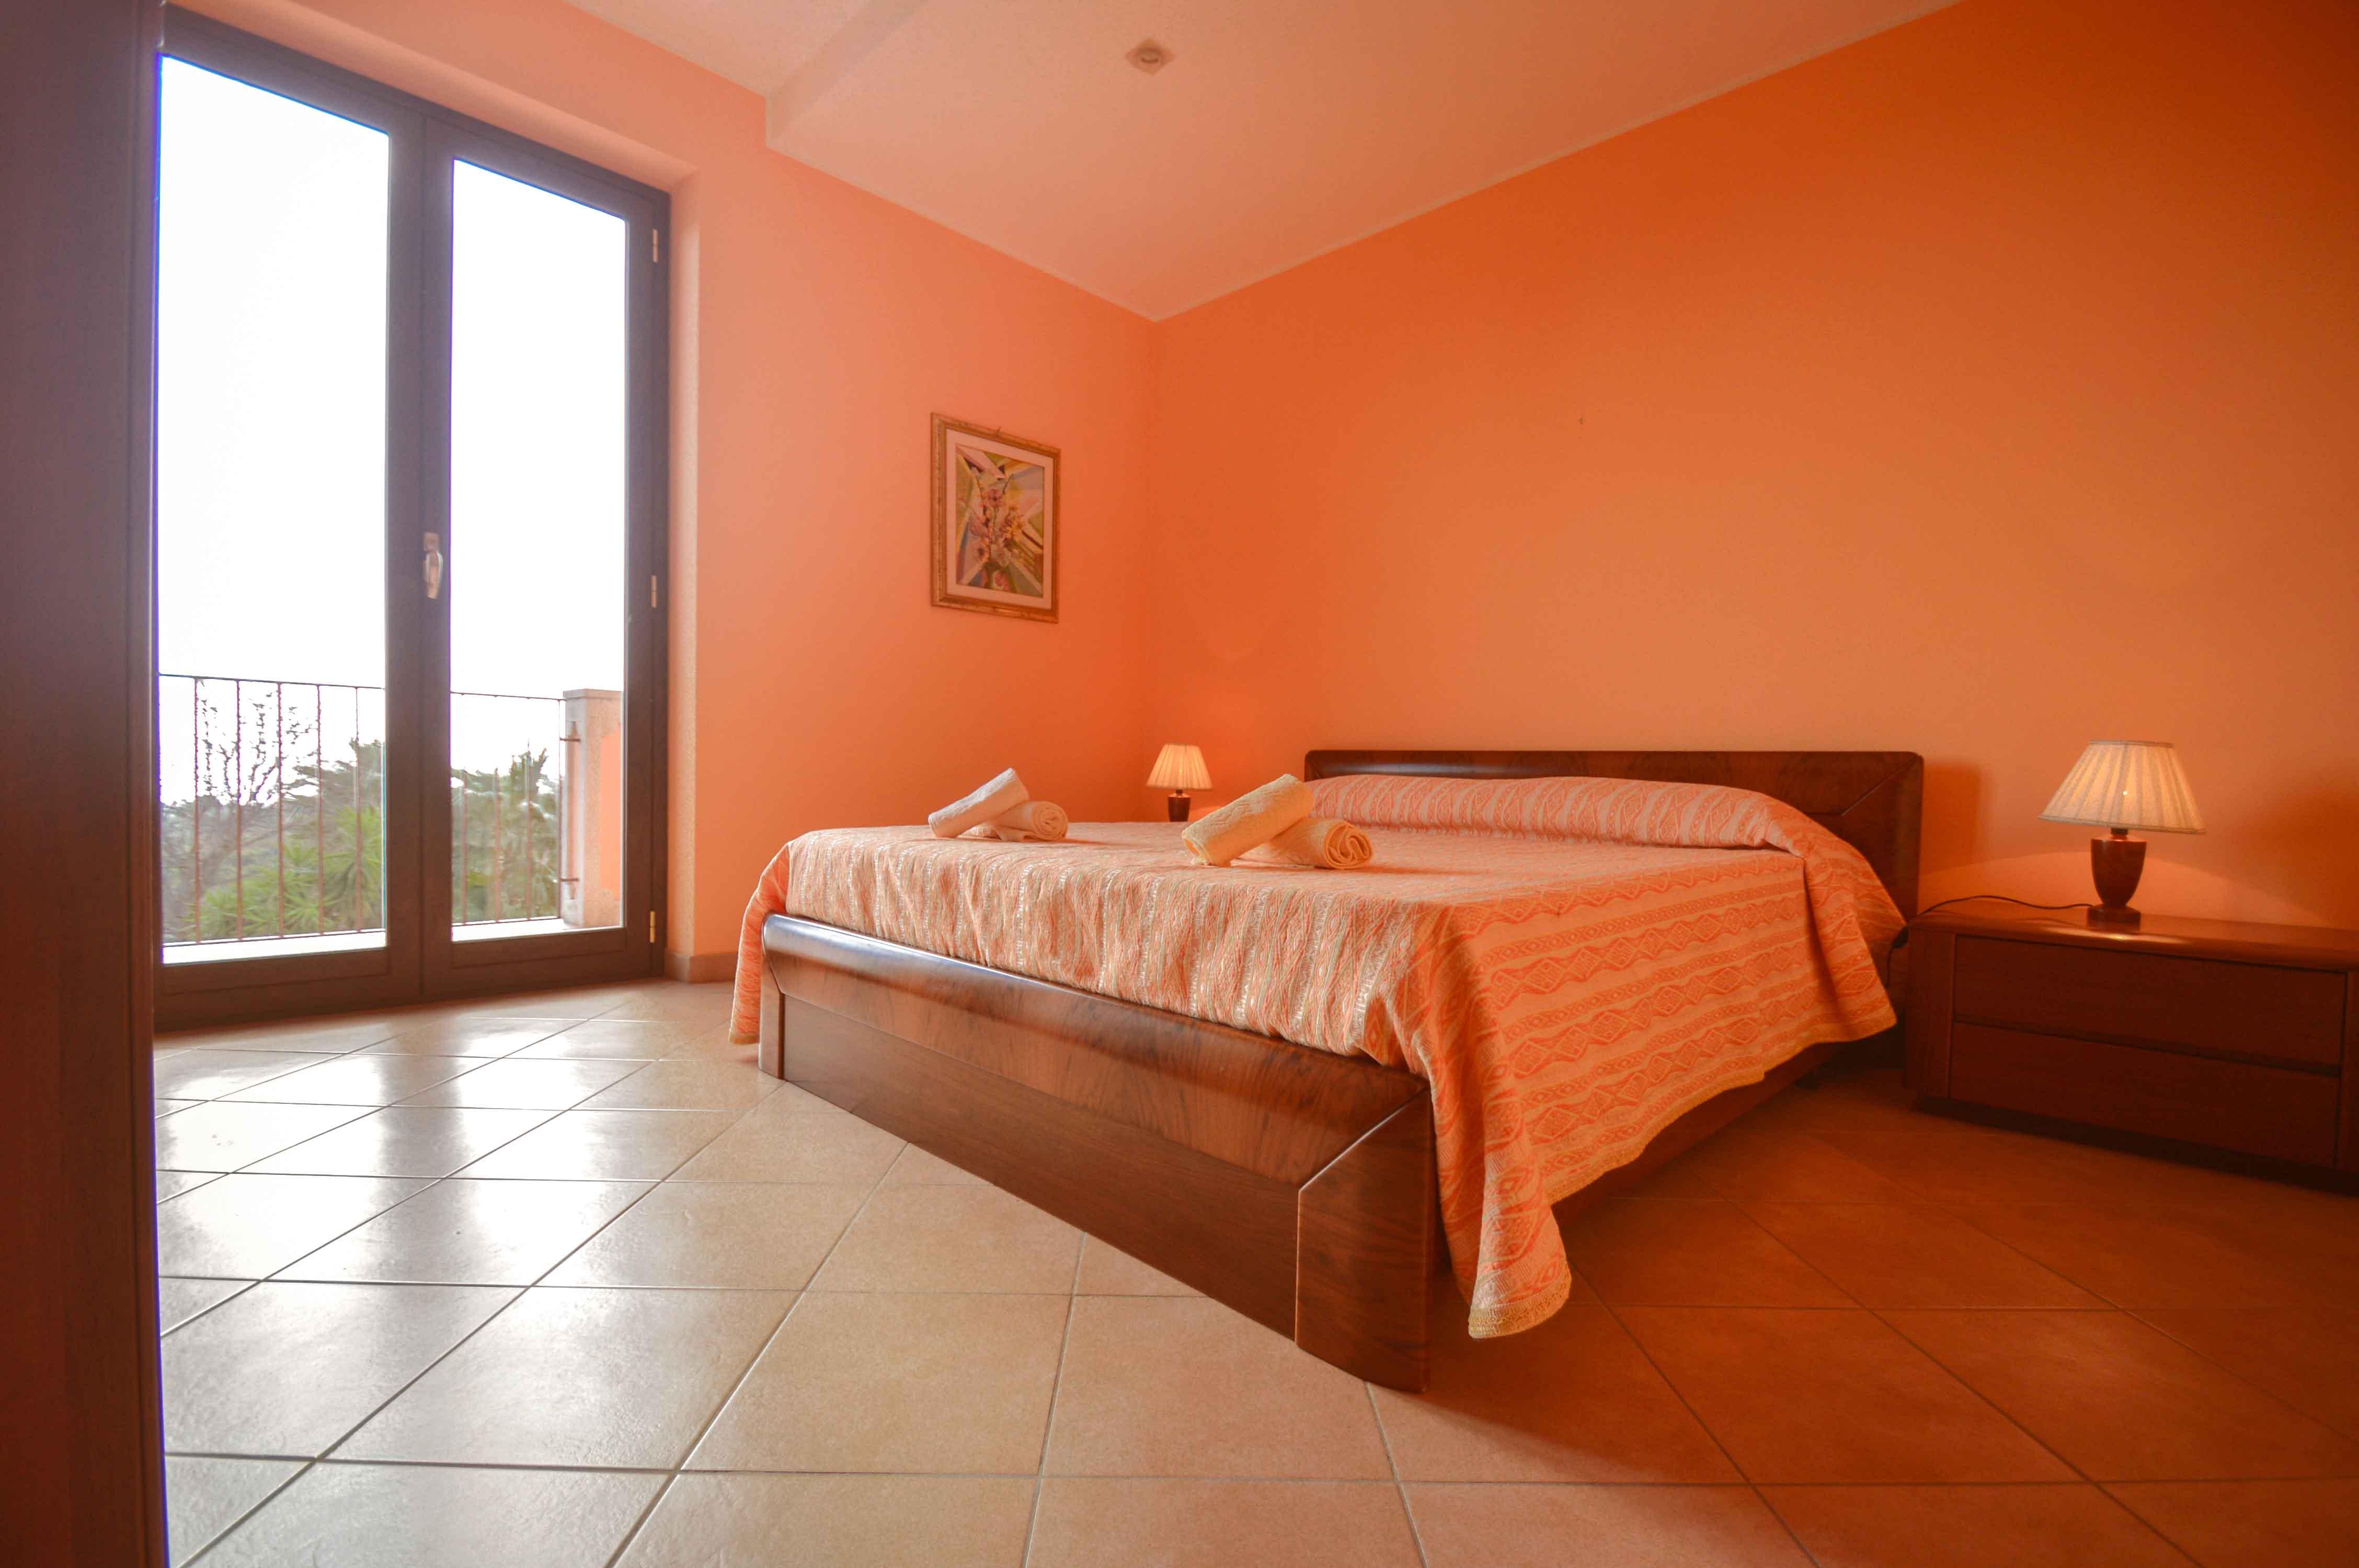 Ferienhaus Villa Giada- enjoys views of Mount Etna and the sea, a true paradise (2383441), Acireale, Catania, Sizilien, Italien, Bild 16